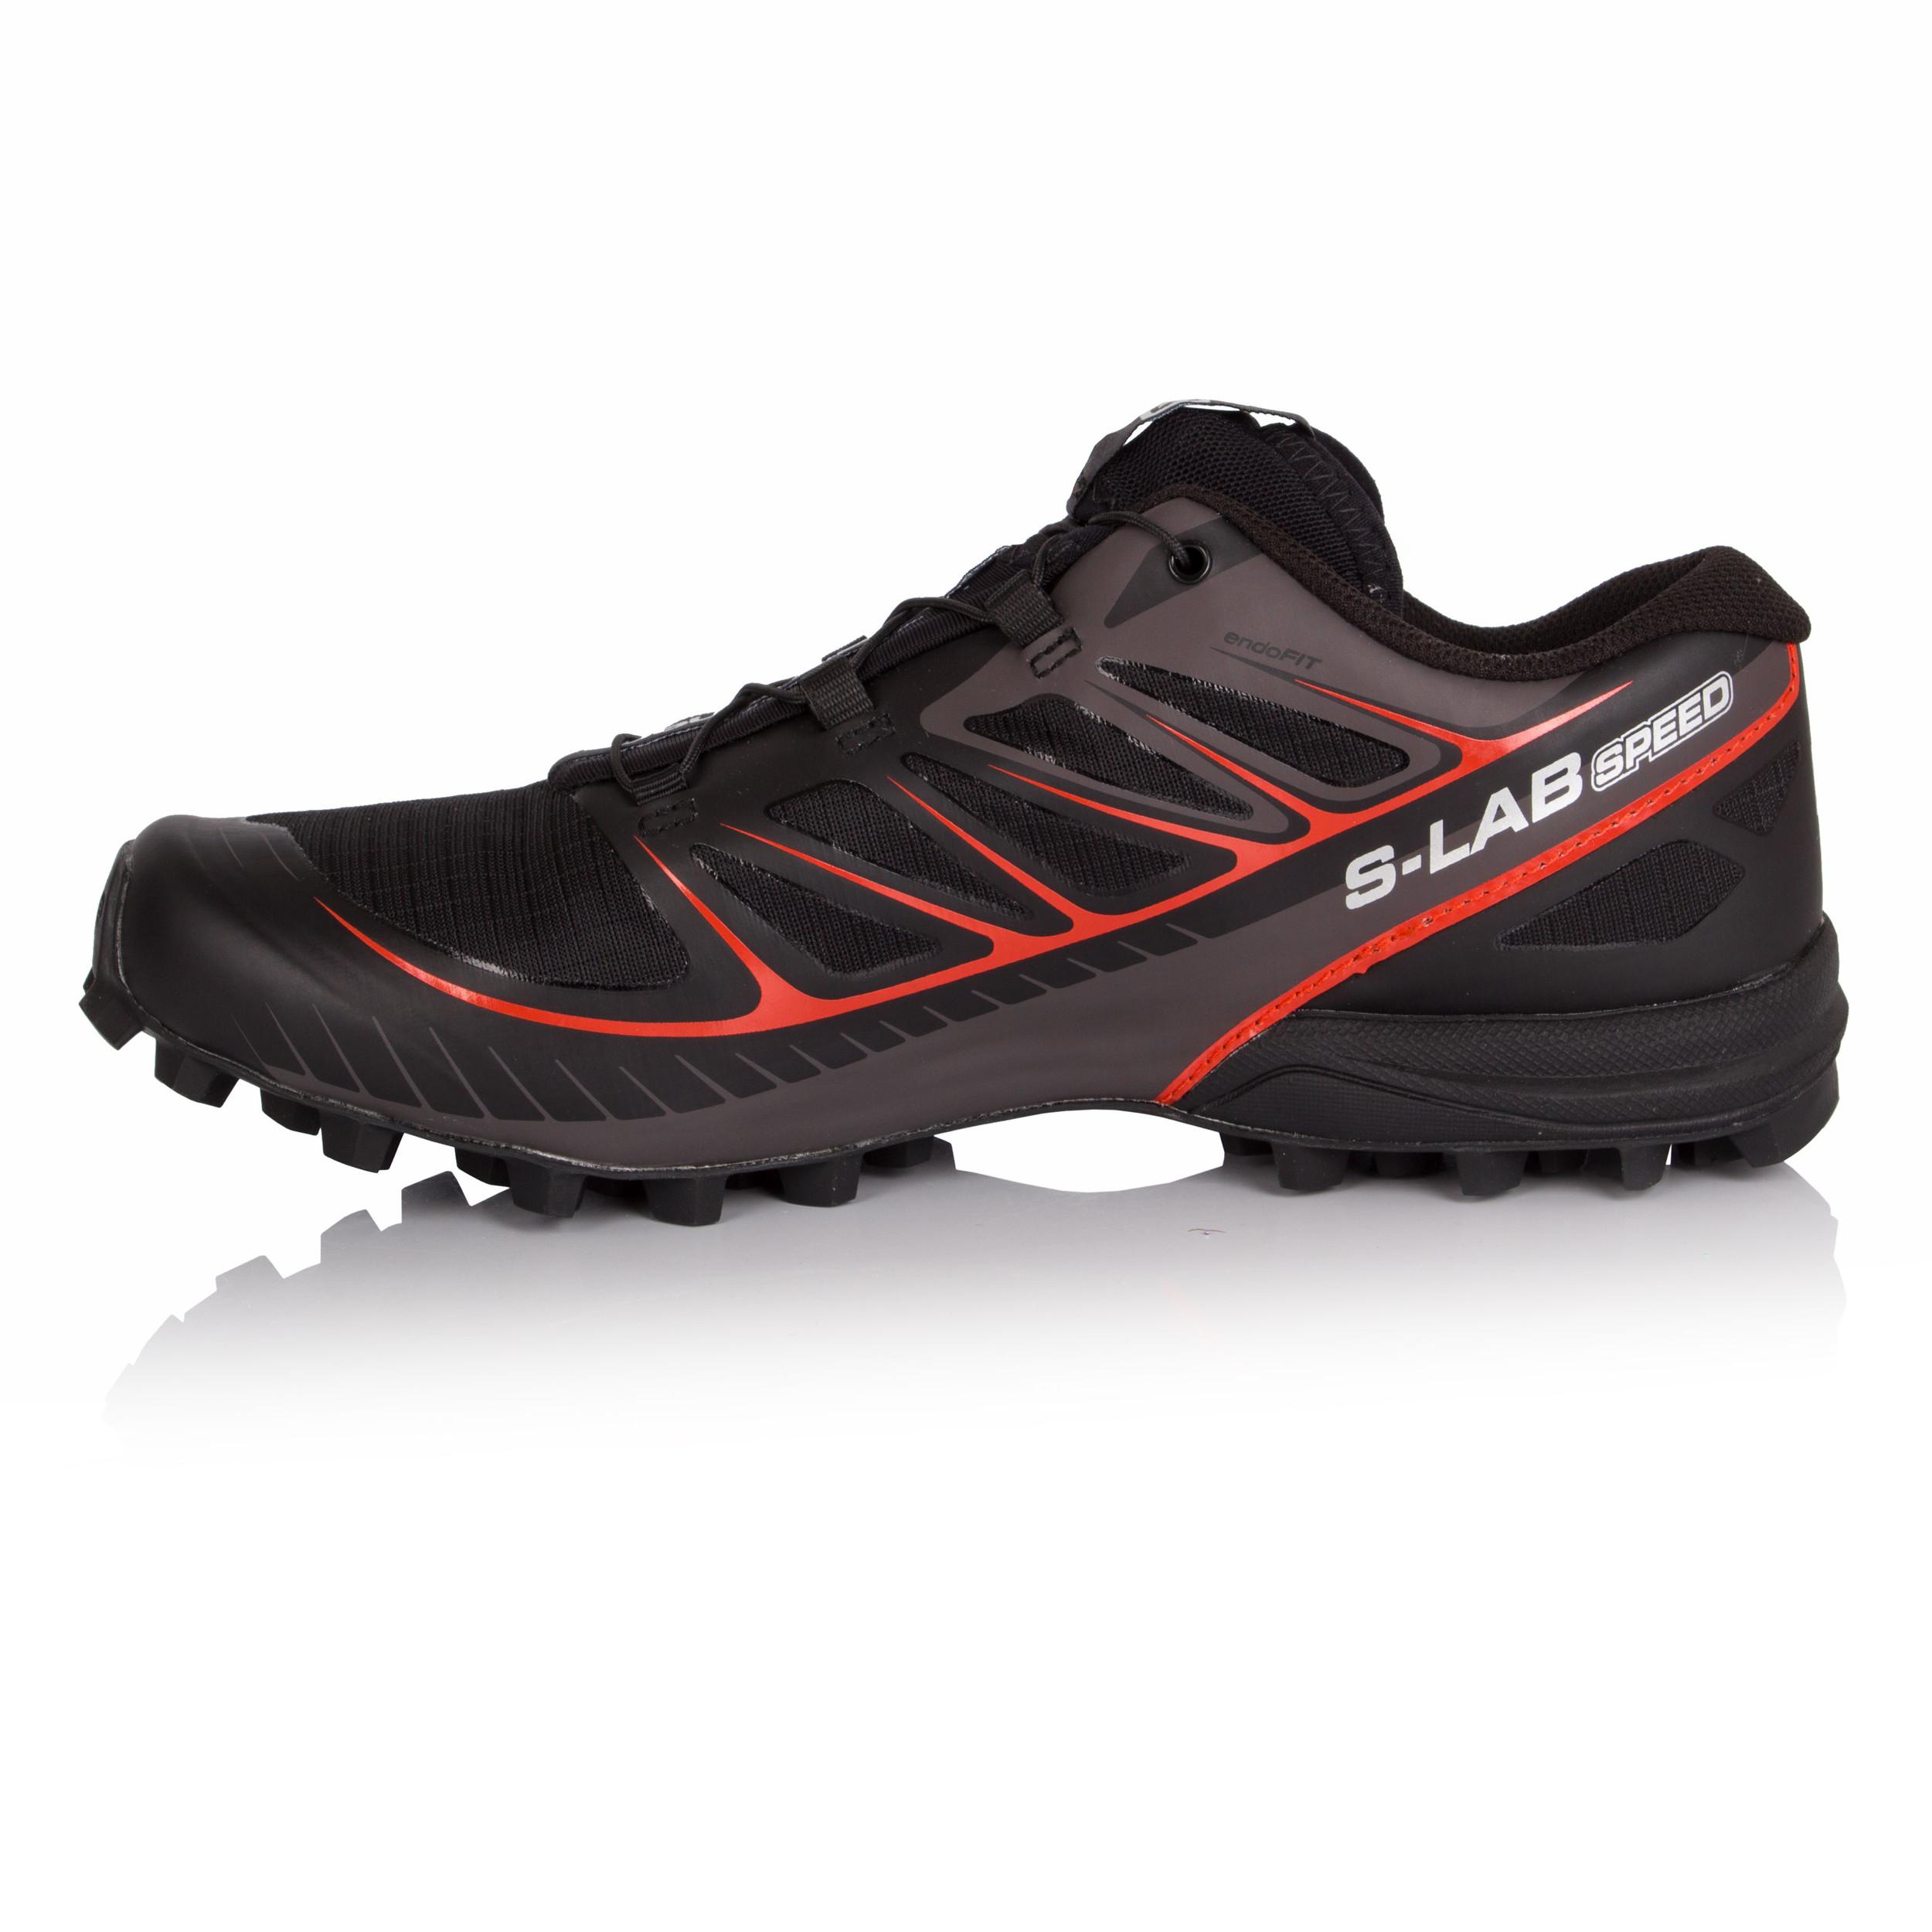 Running S Black Shoes Sports Lab Sensifit Speed Mens Salomon Trail ikXuZPOT